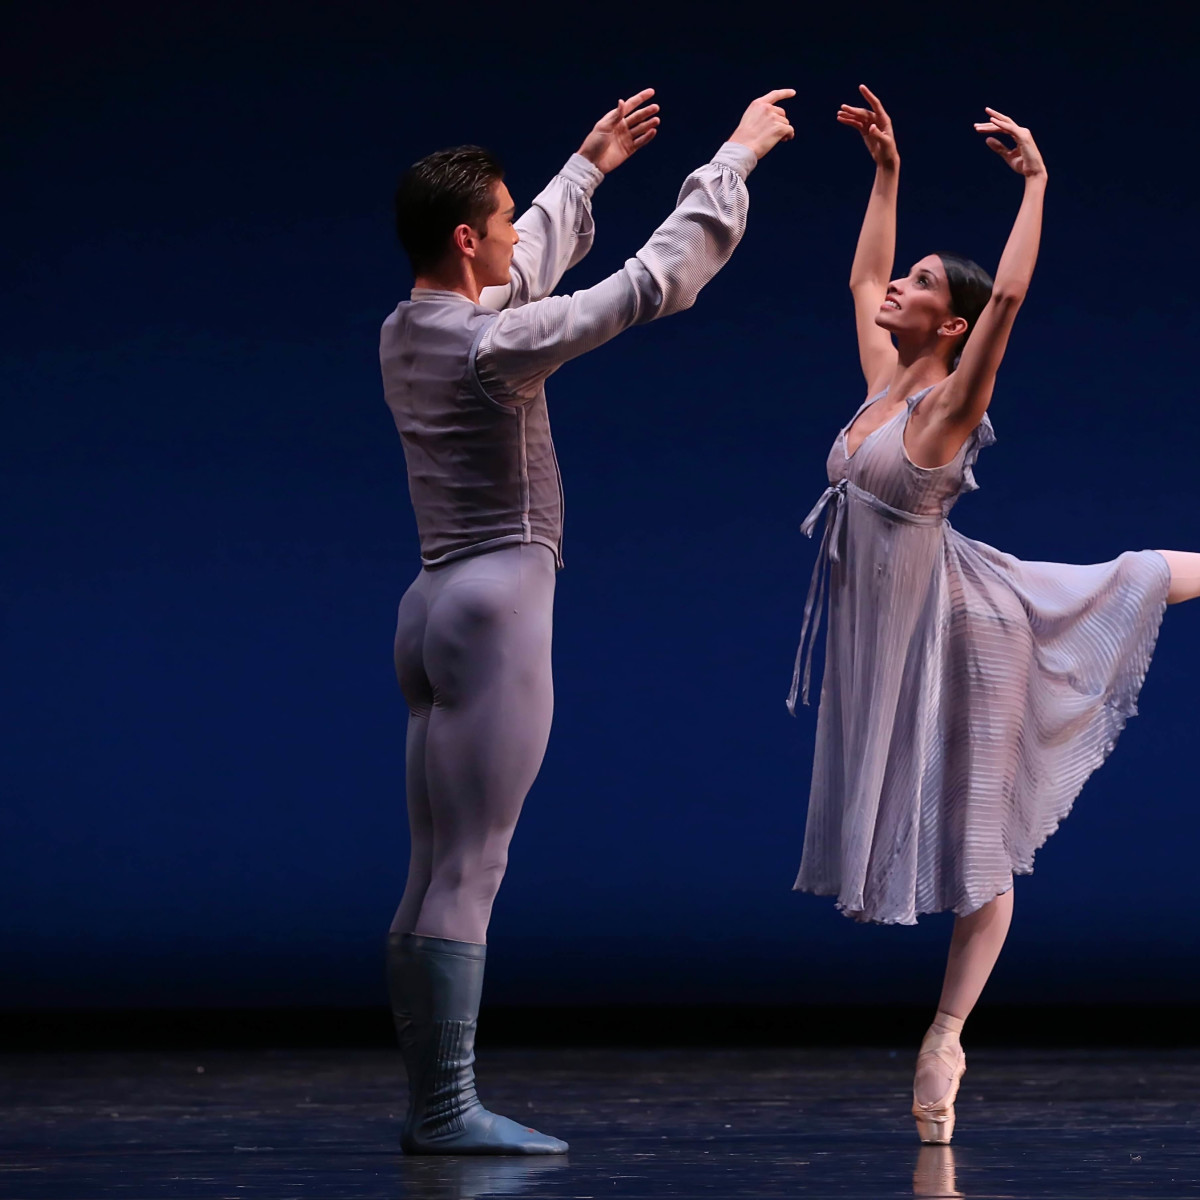 Houston Ballet 9.16, Other Dances, Karina Gonzalez_Charles-Louis Yoshiyama